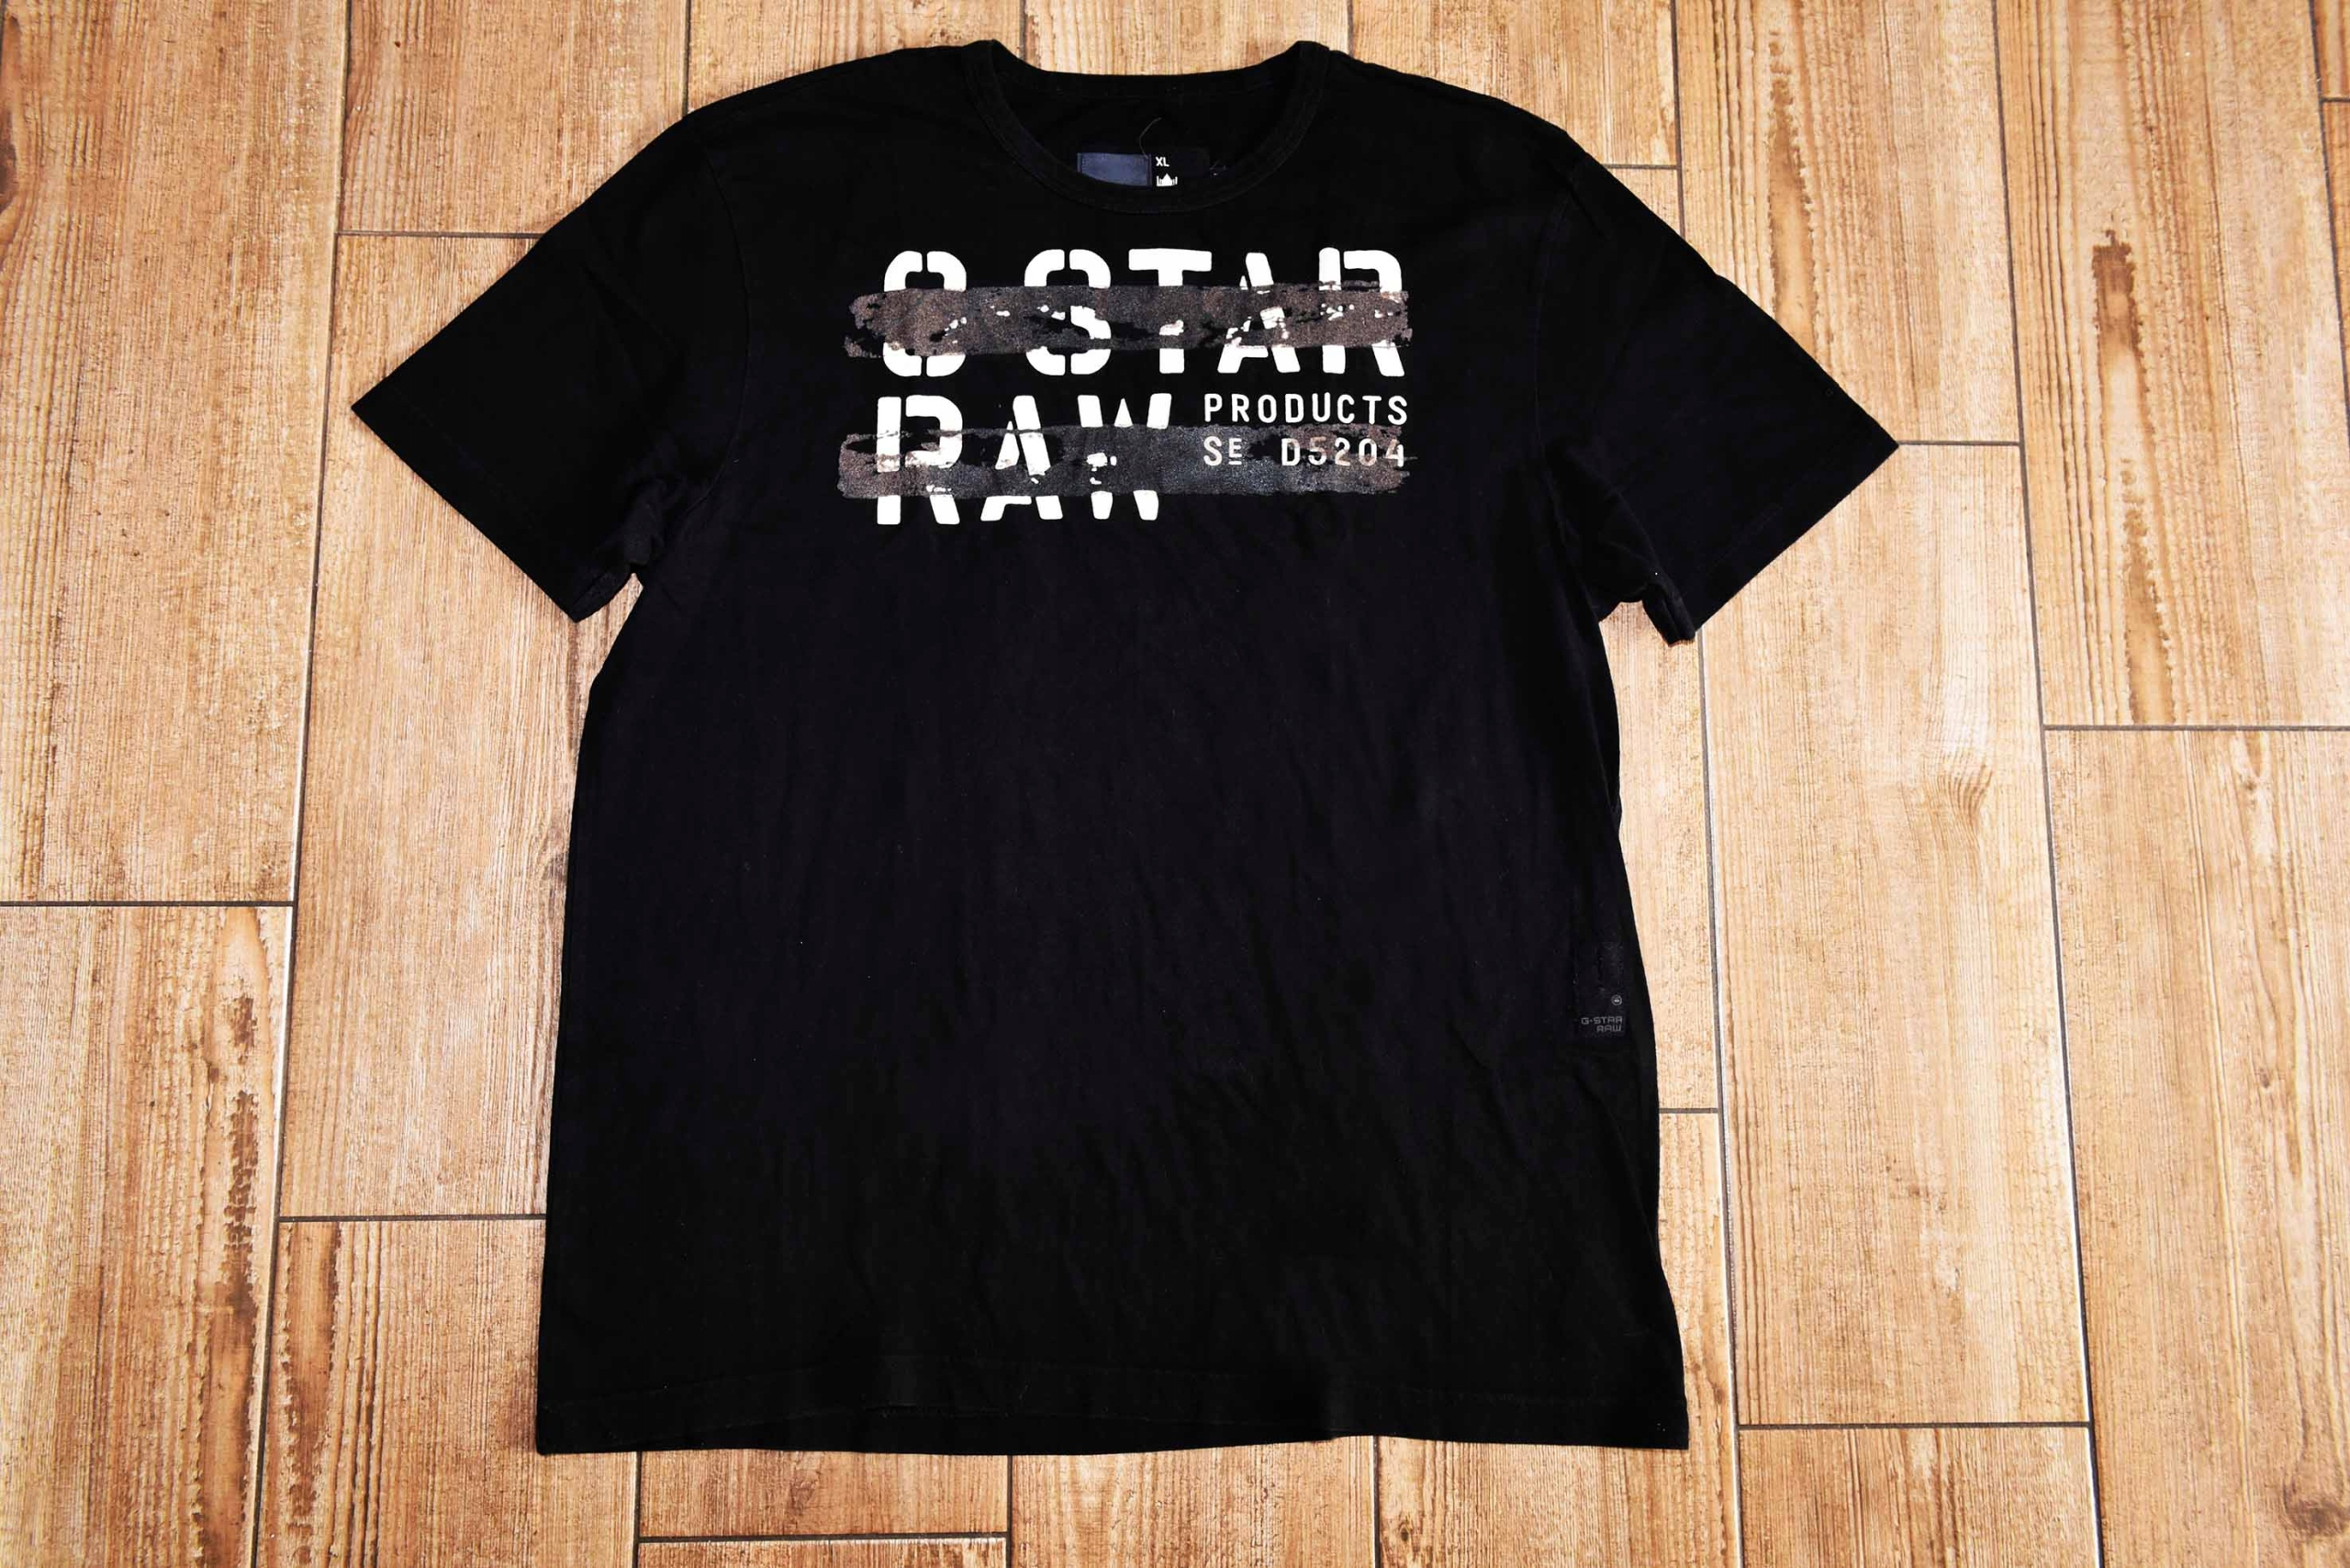 G-star __ t shirt exclusive design / R.XL